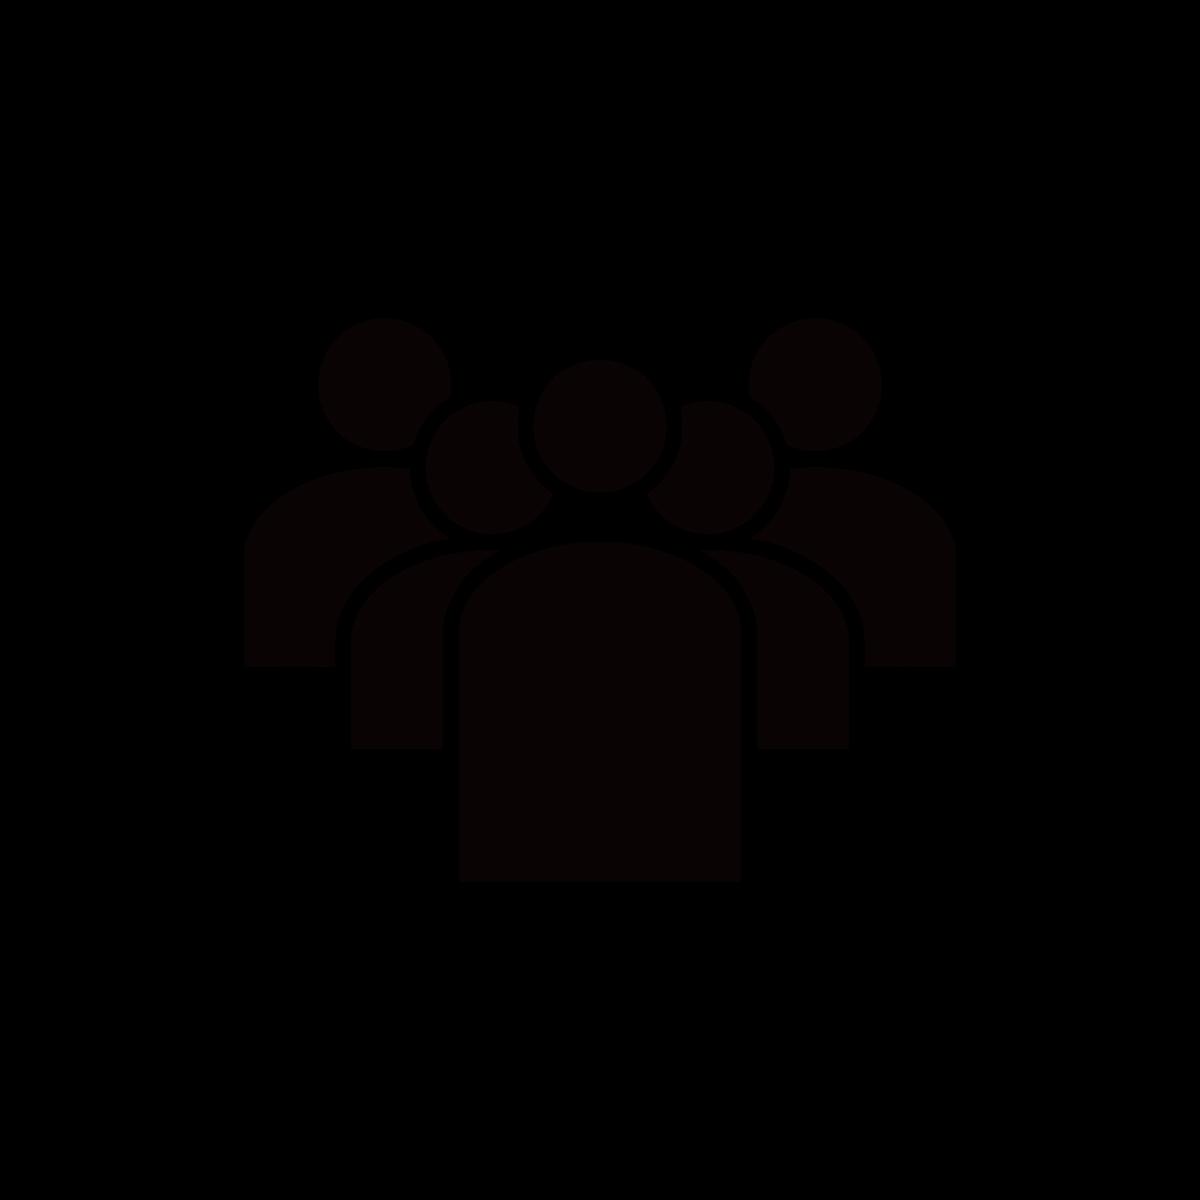 noun_Family_848128